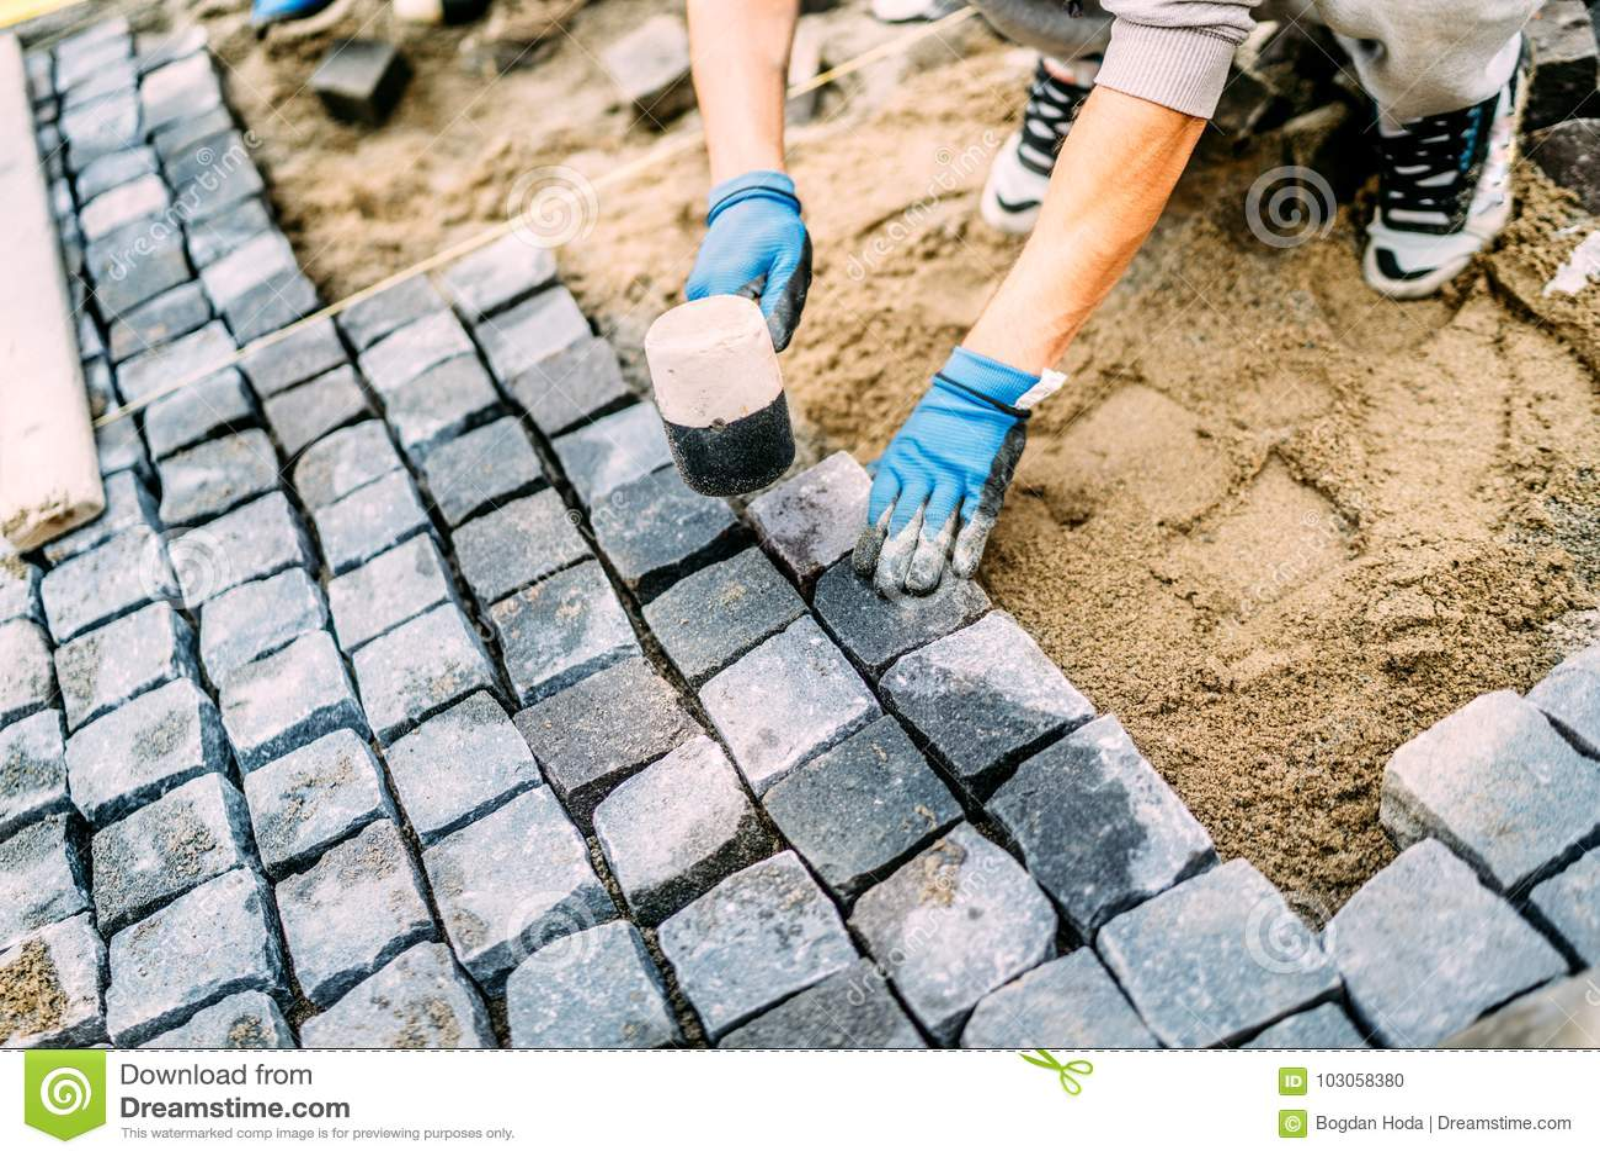 construction worker, handyman using cobblestone granite stones for creating walking path. Terrace or sidewalk details